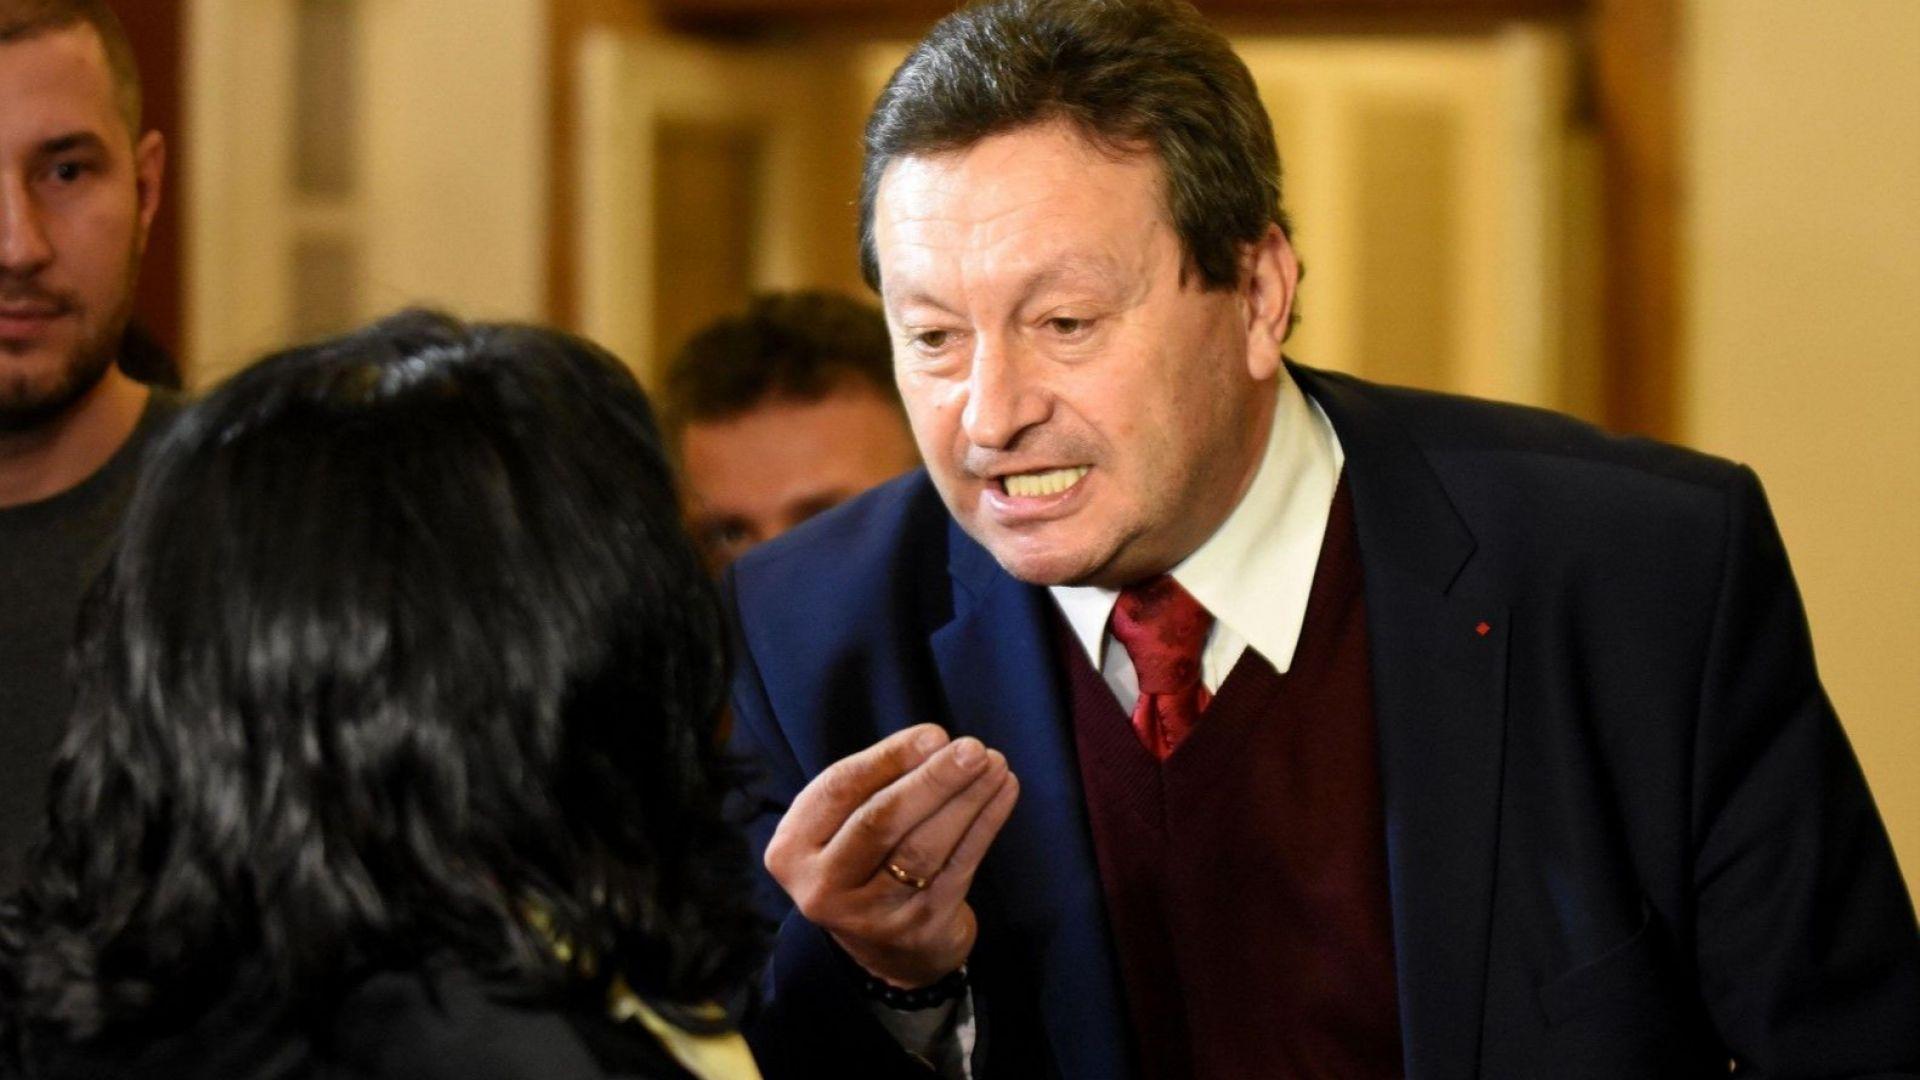 След извършена проверка Софийска градска прокуратура (СГП) постанови отказ да